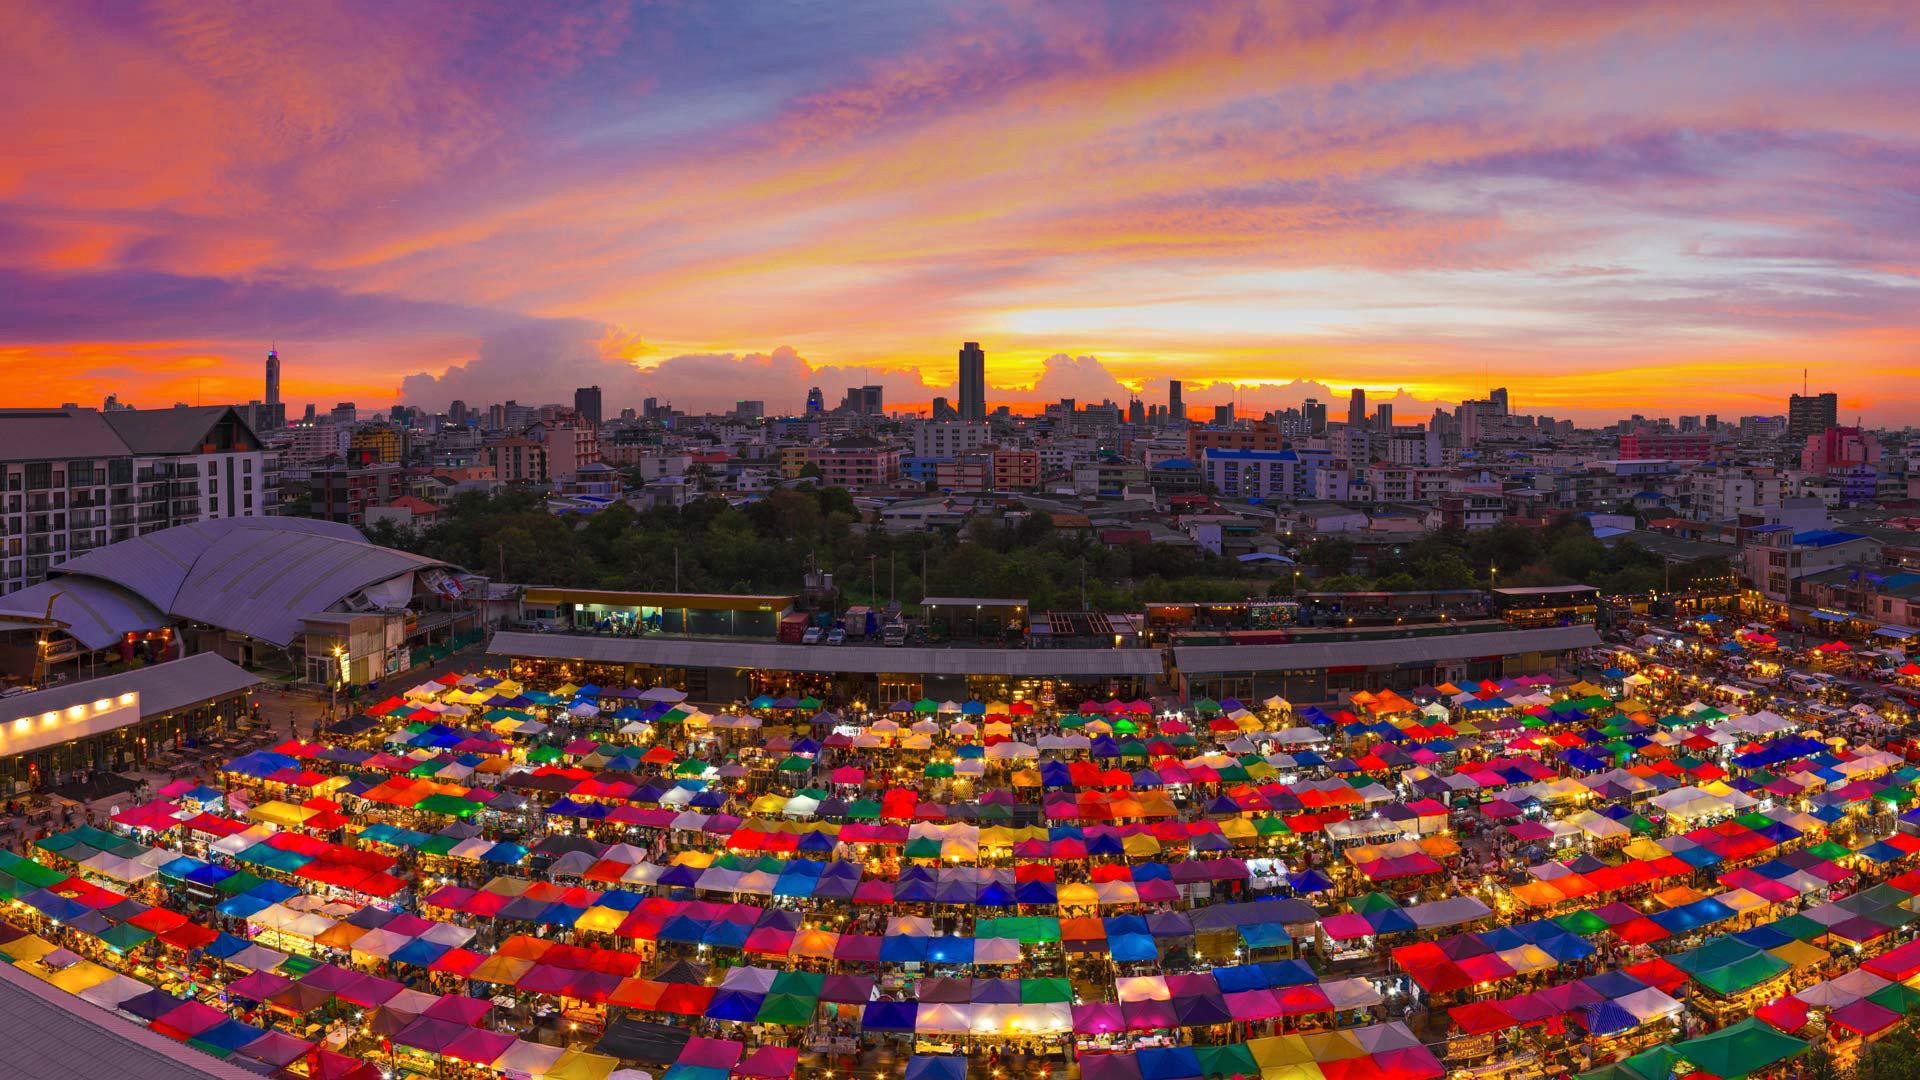 Free Bangkok High Quality Background Id 478003 For Hd 1080p Desktop